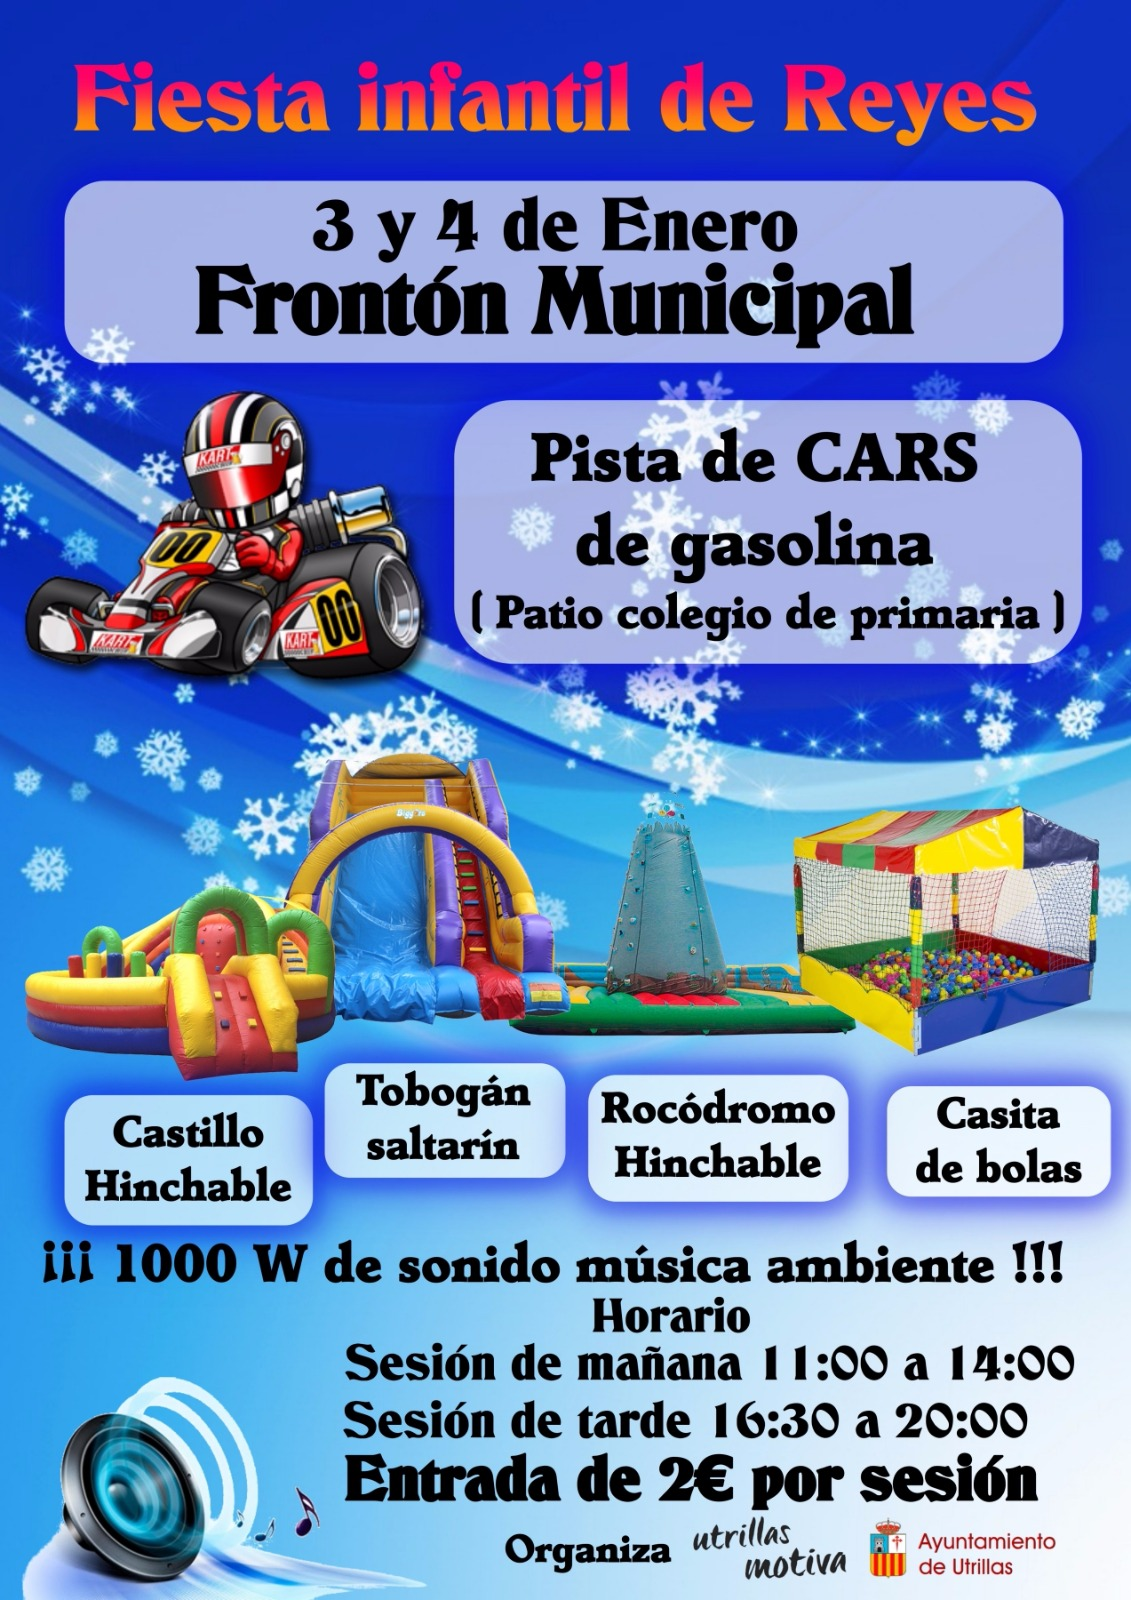 Fiesta Infantil de Reyes